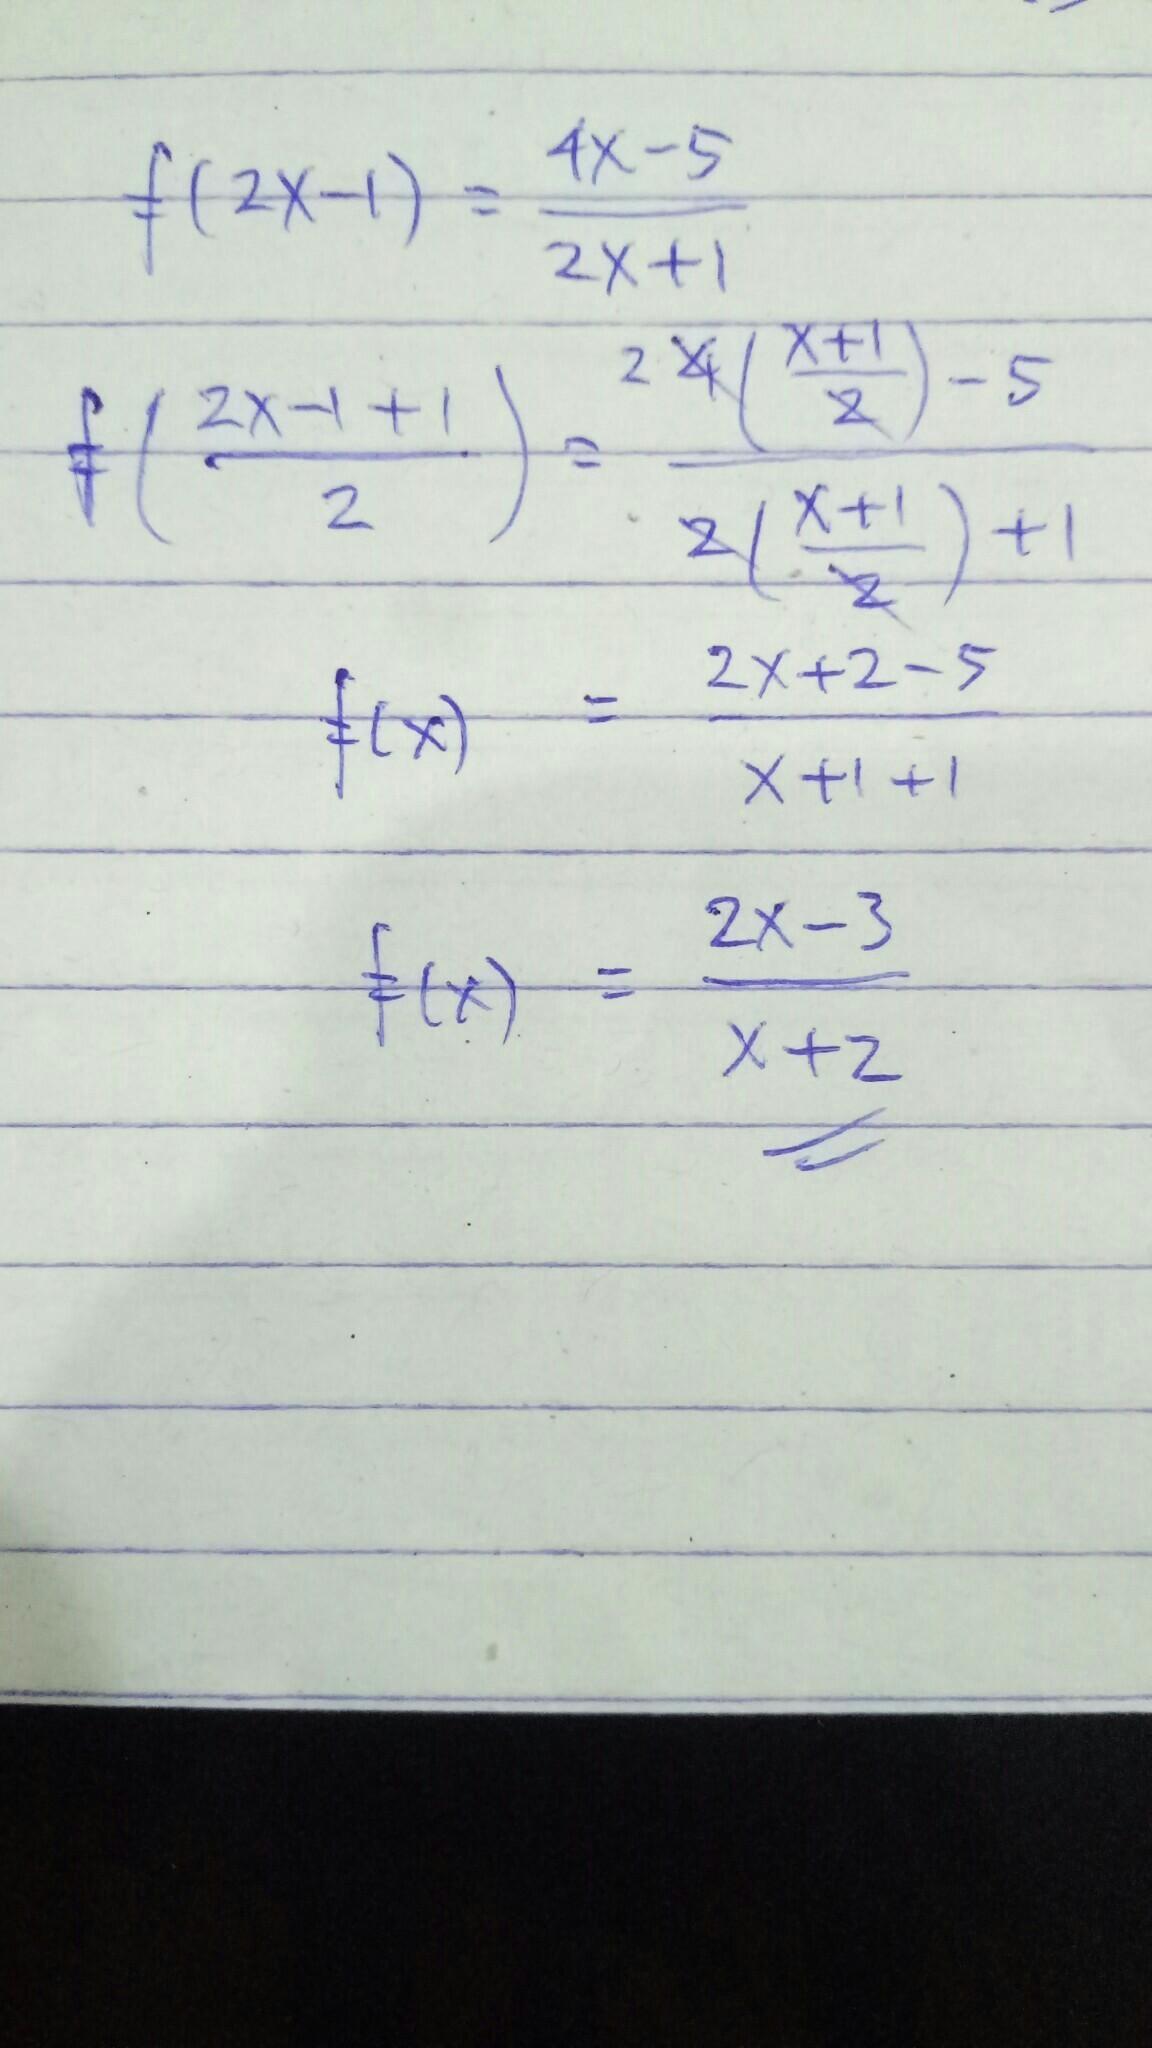 Jika F 2x 1 4x 5 2x 1 Maka F X Brainly Co Id